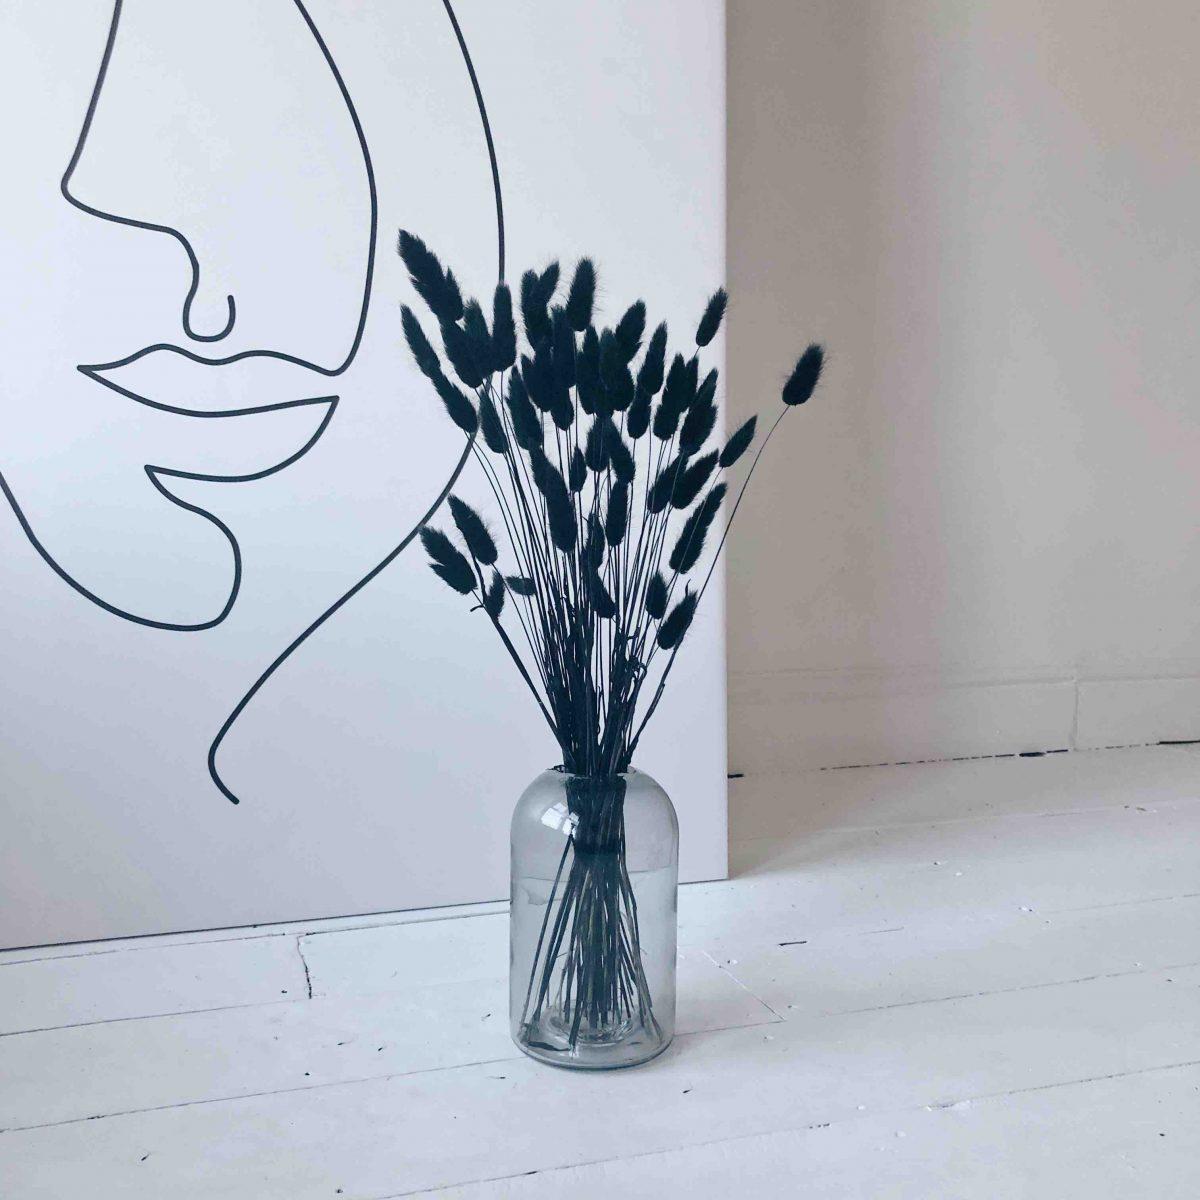 black bunny tails, black pampas, black dried flowers, rabbit tails, bunny grass, canary grass, monochrome decor, vase arrangement